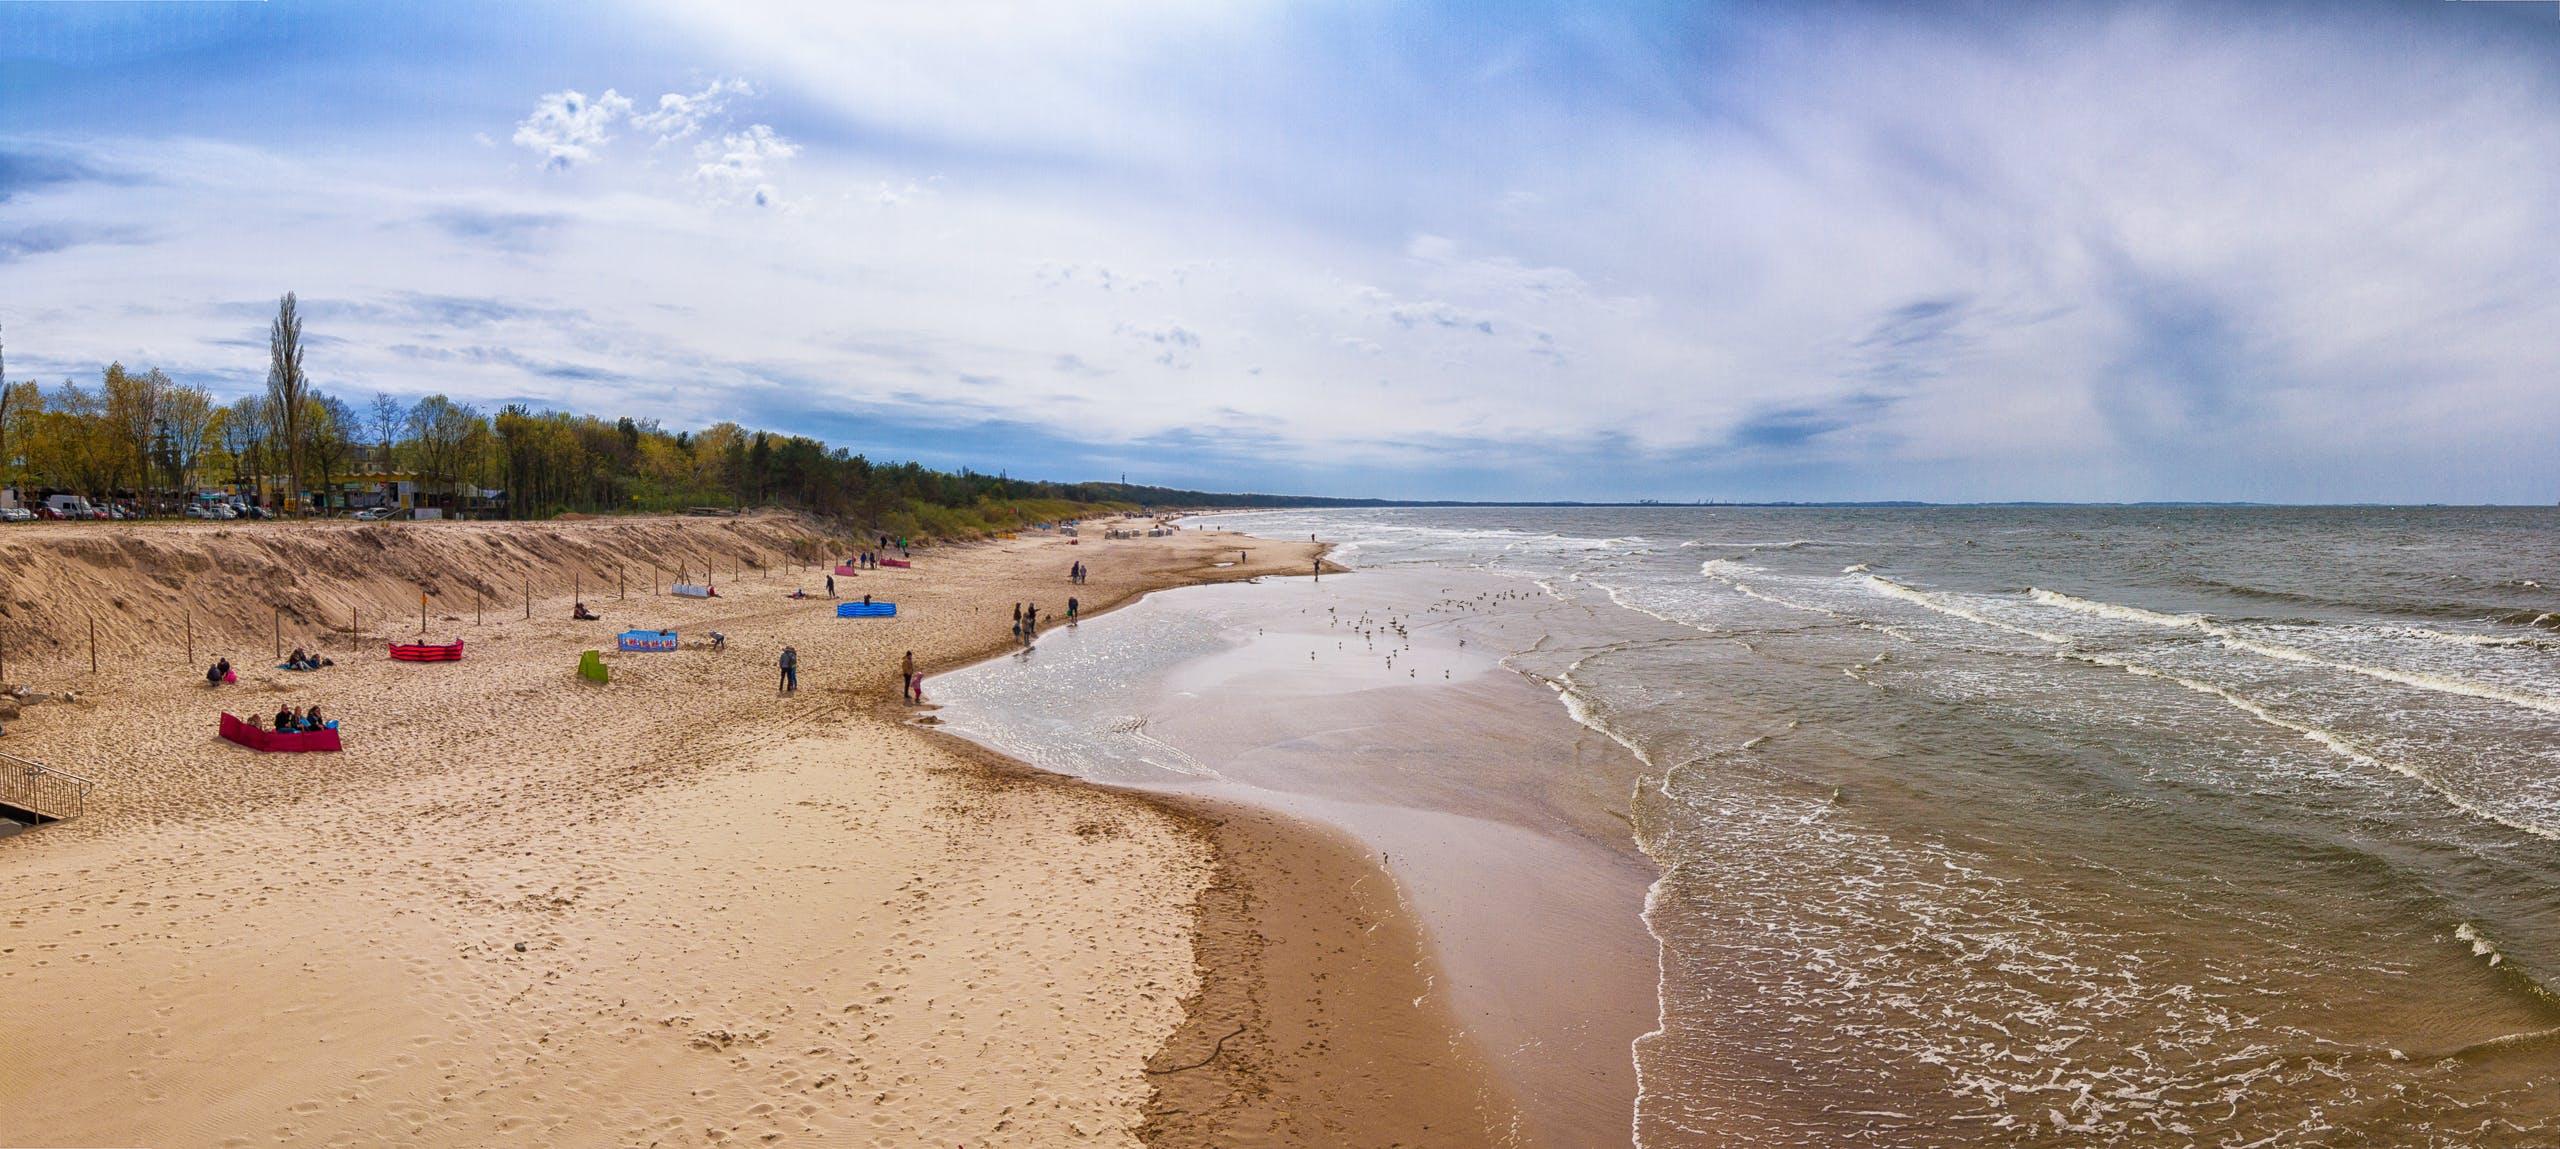 Free stock photo of beach, coastline, miedzyzdroje, molo